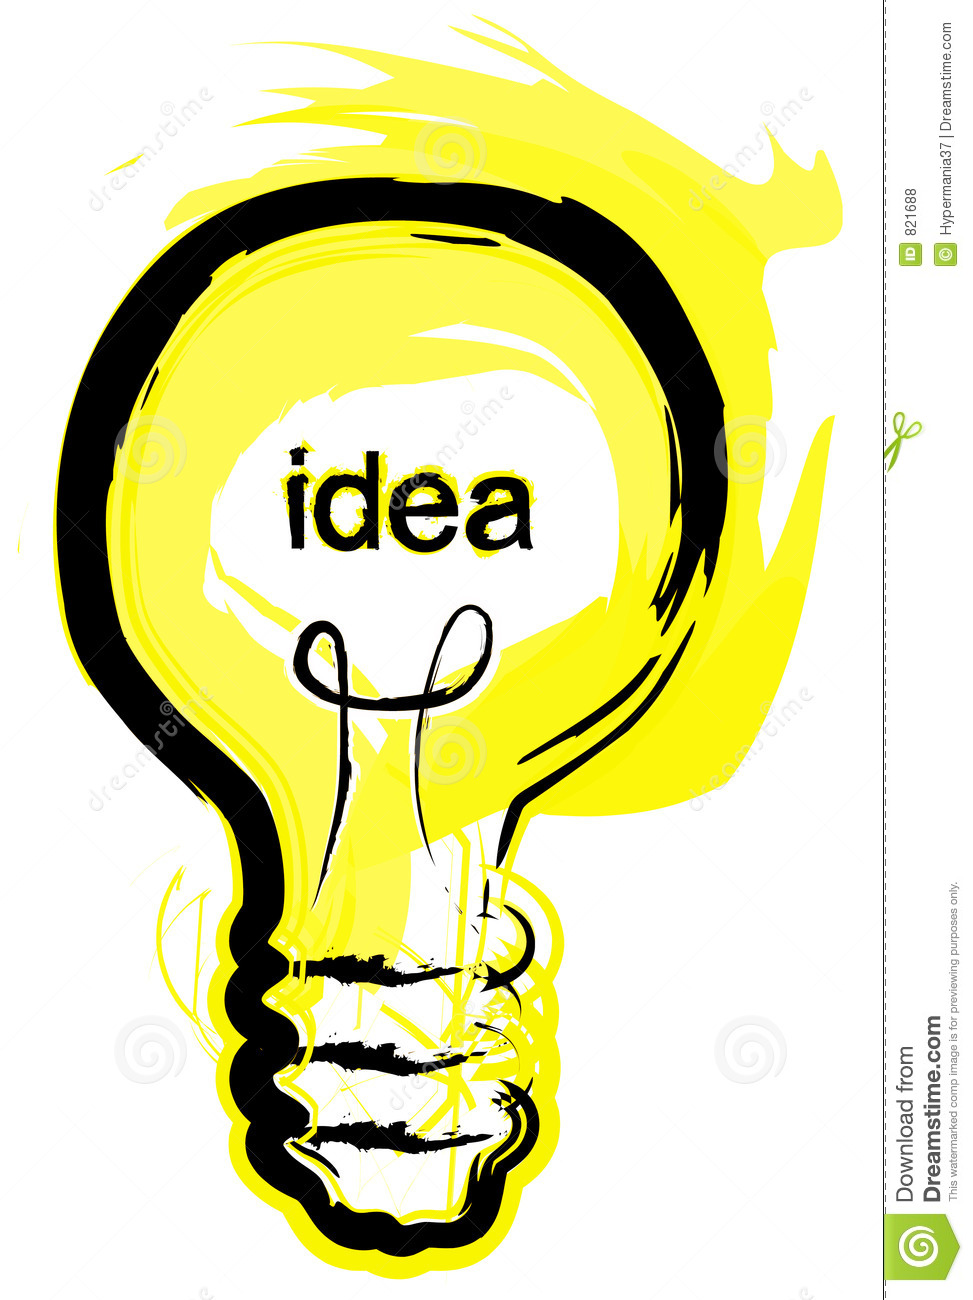 Idea clipart light bulb Idea Images Light Clip Clipart